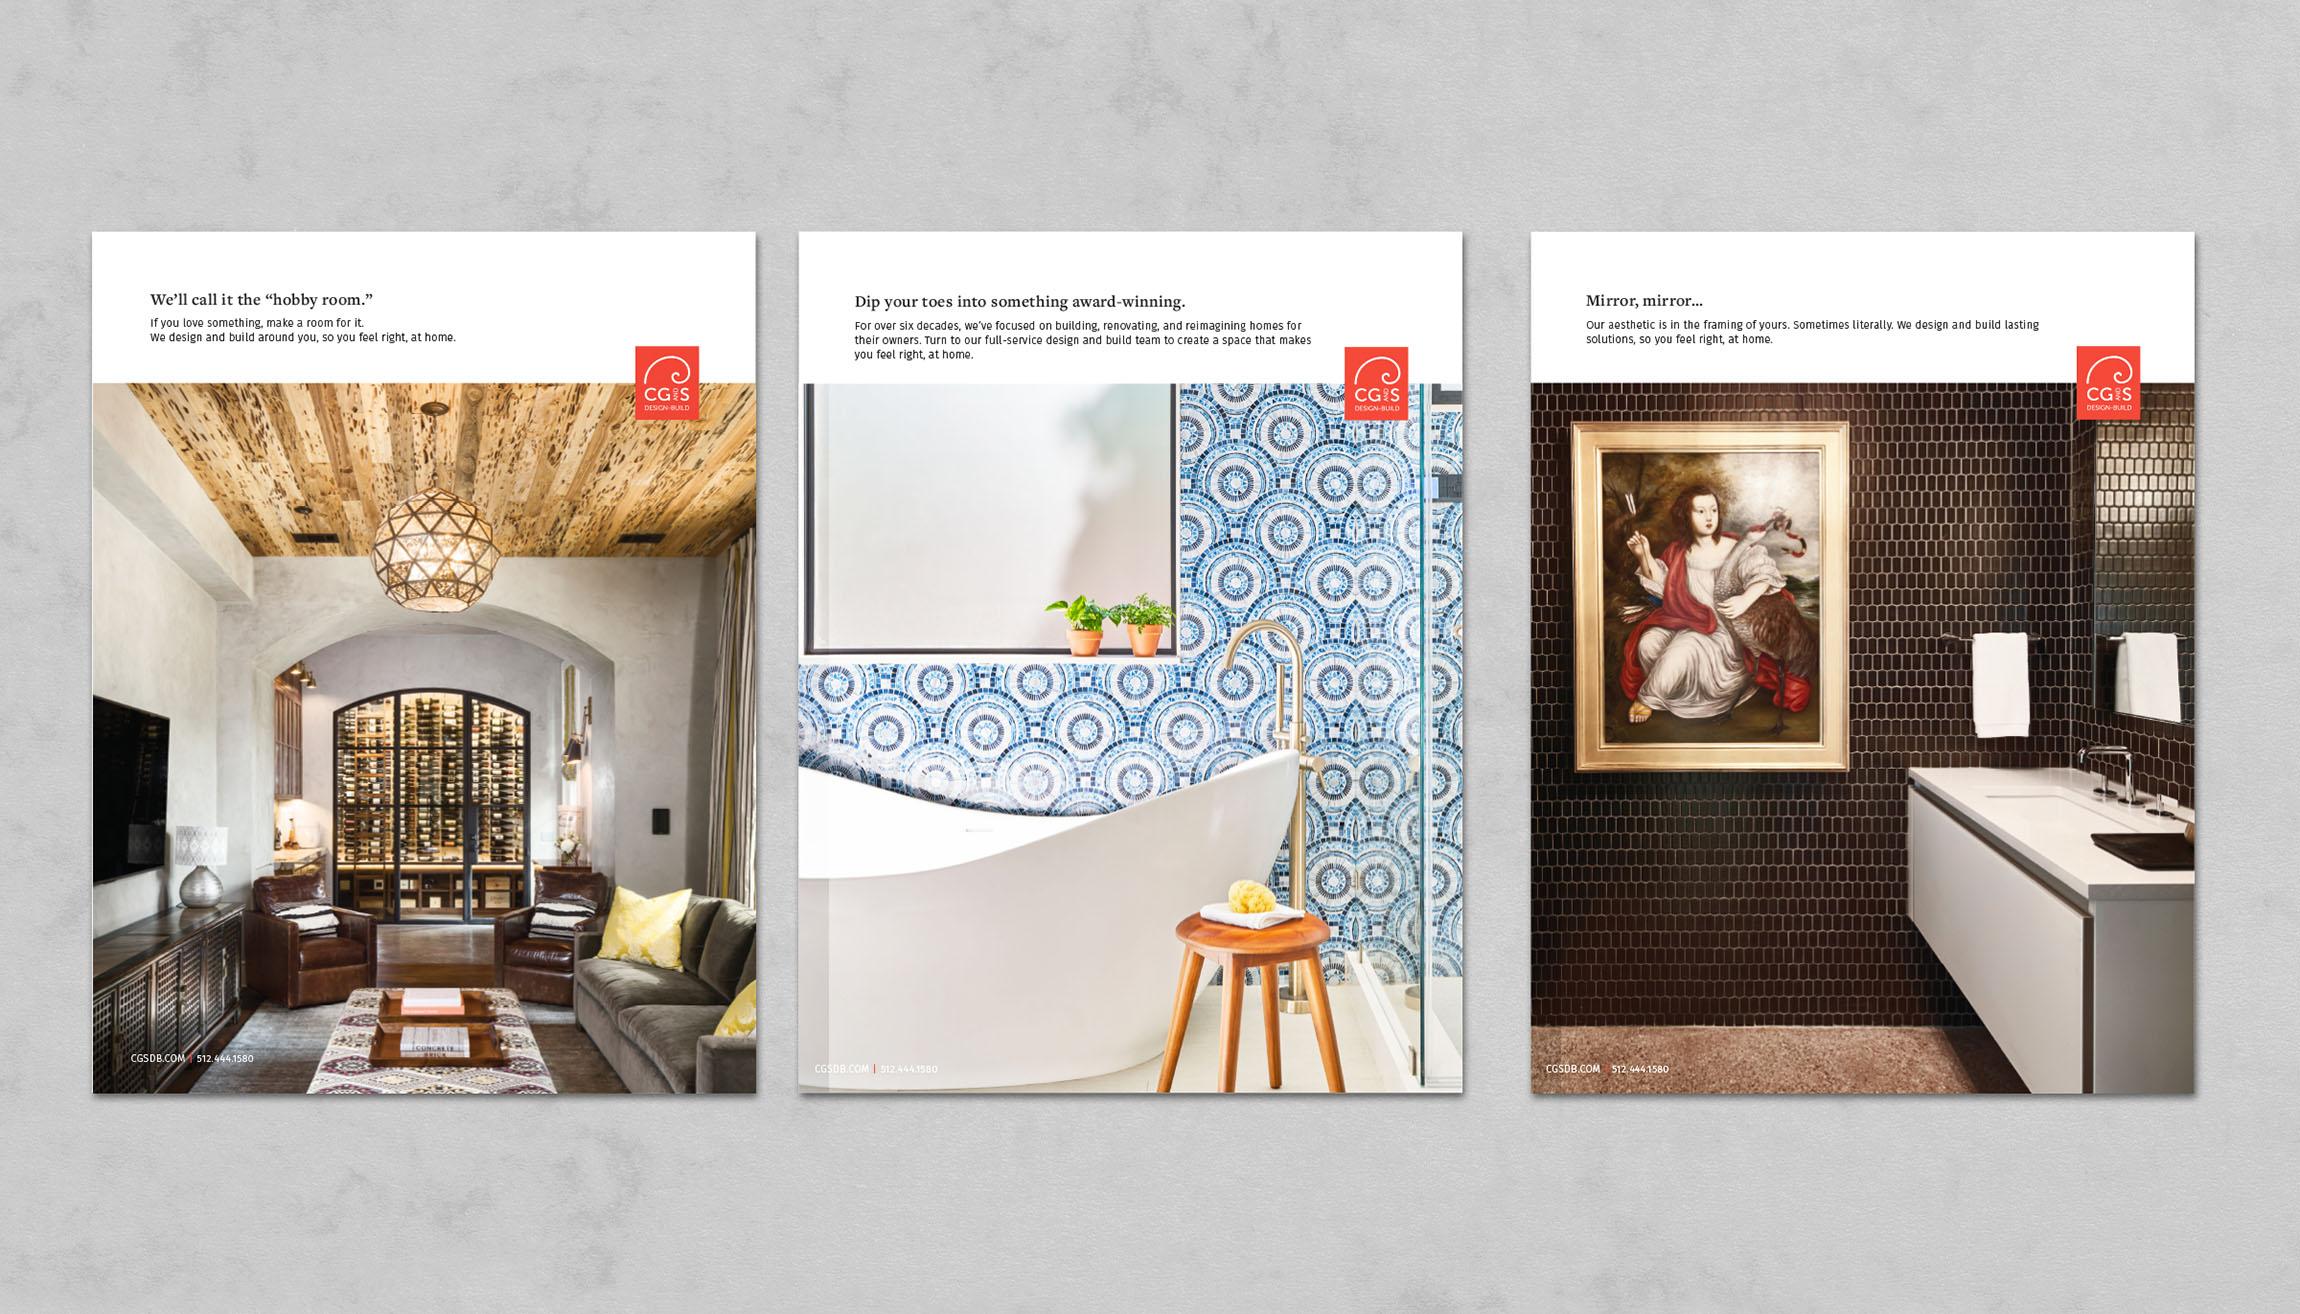 Set of three CG&S print ads showcasing renovated rooms.